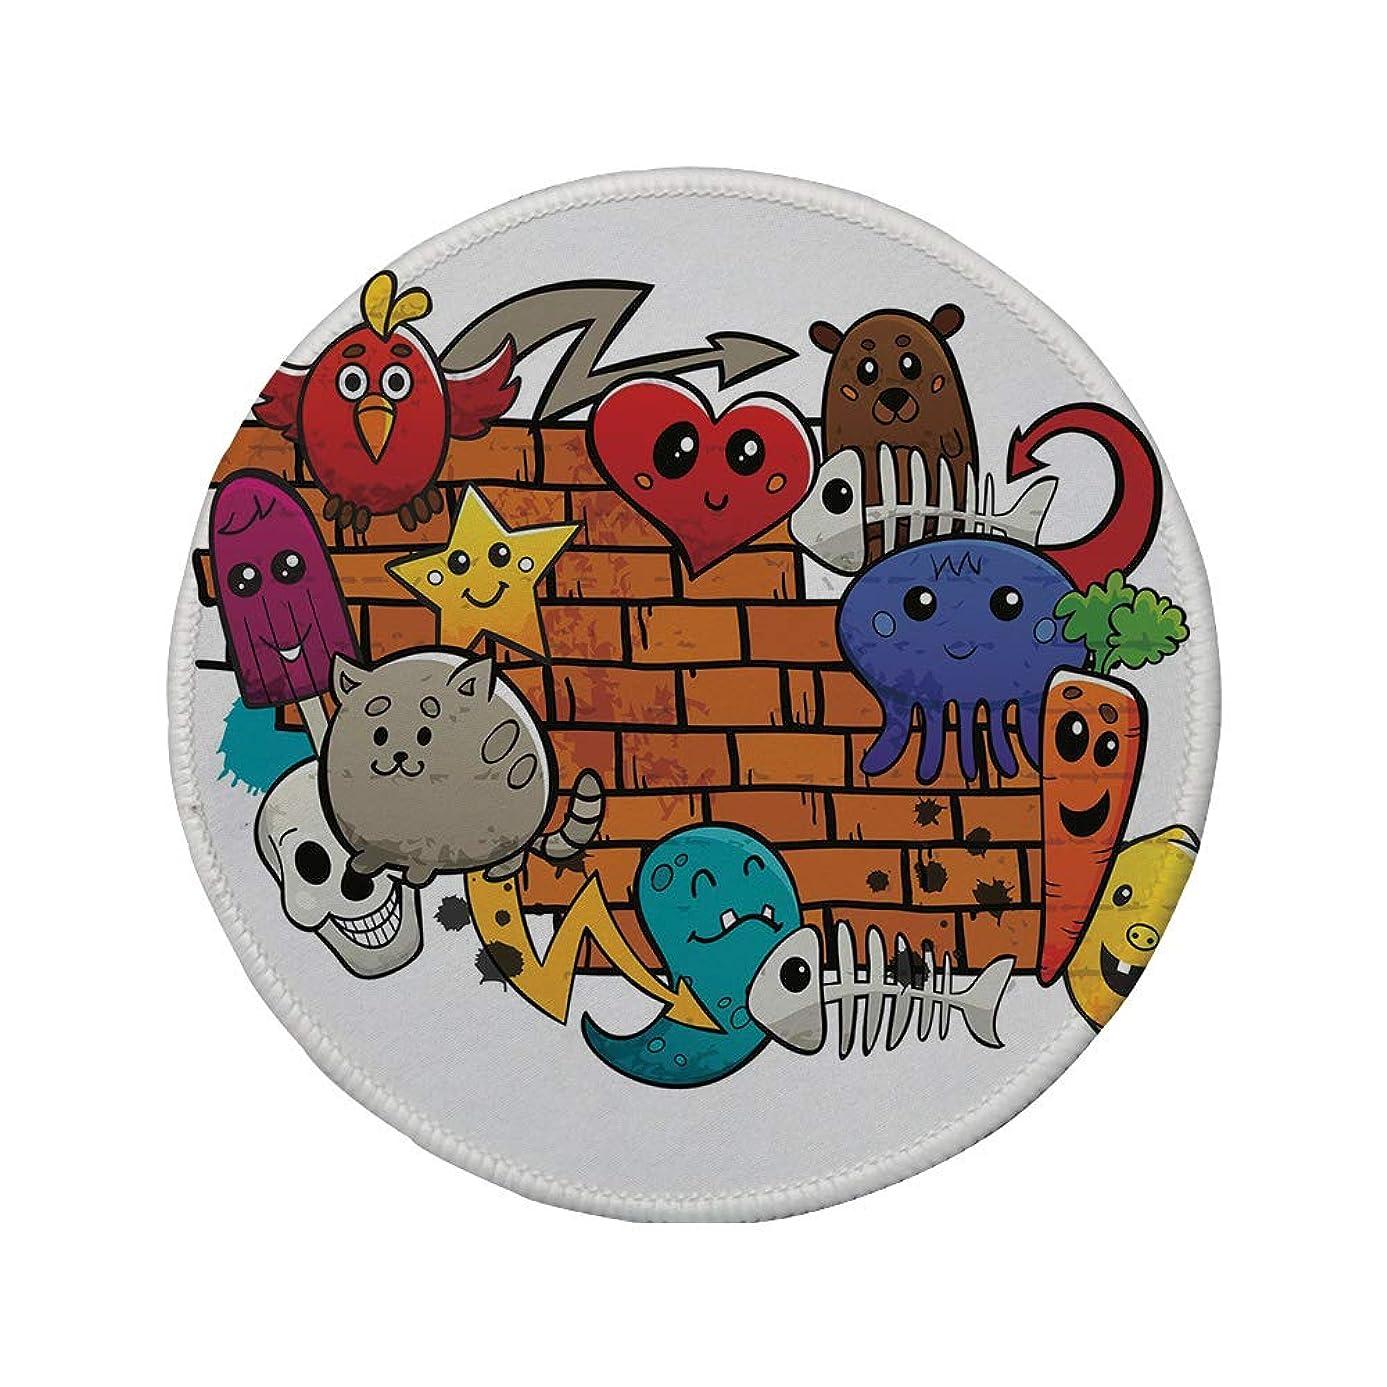 Non-Slip Rubber Round Mouse Pad,Graffiti Decor,Cute Cartoon Animals Stars Fish Skulls Cat Bird Figures on Brick Wall Kids Design,Multi,11.8